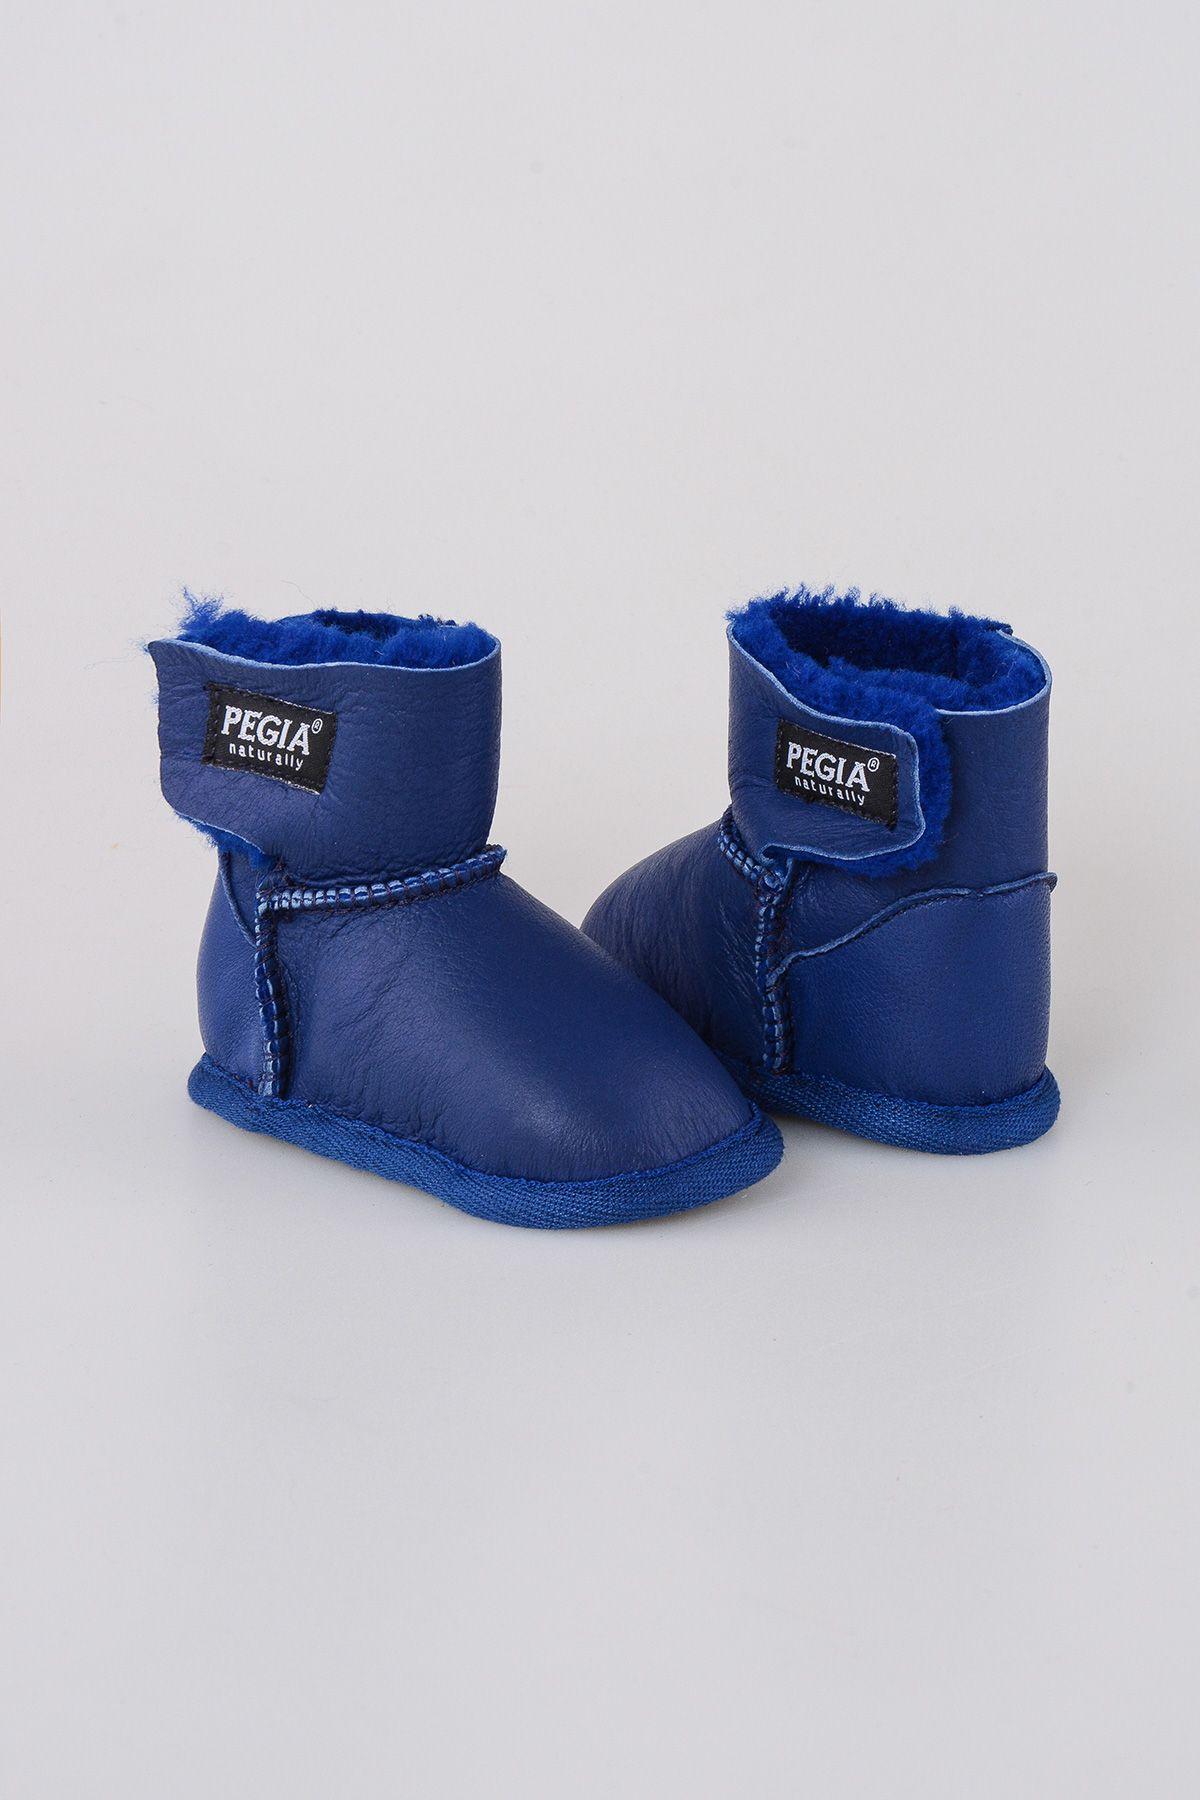 Pegia Hakiki Kürk Bebek Patiği 143005 Mavi